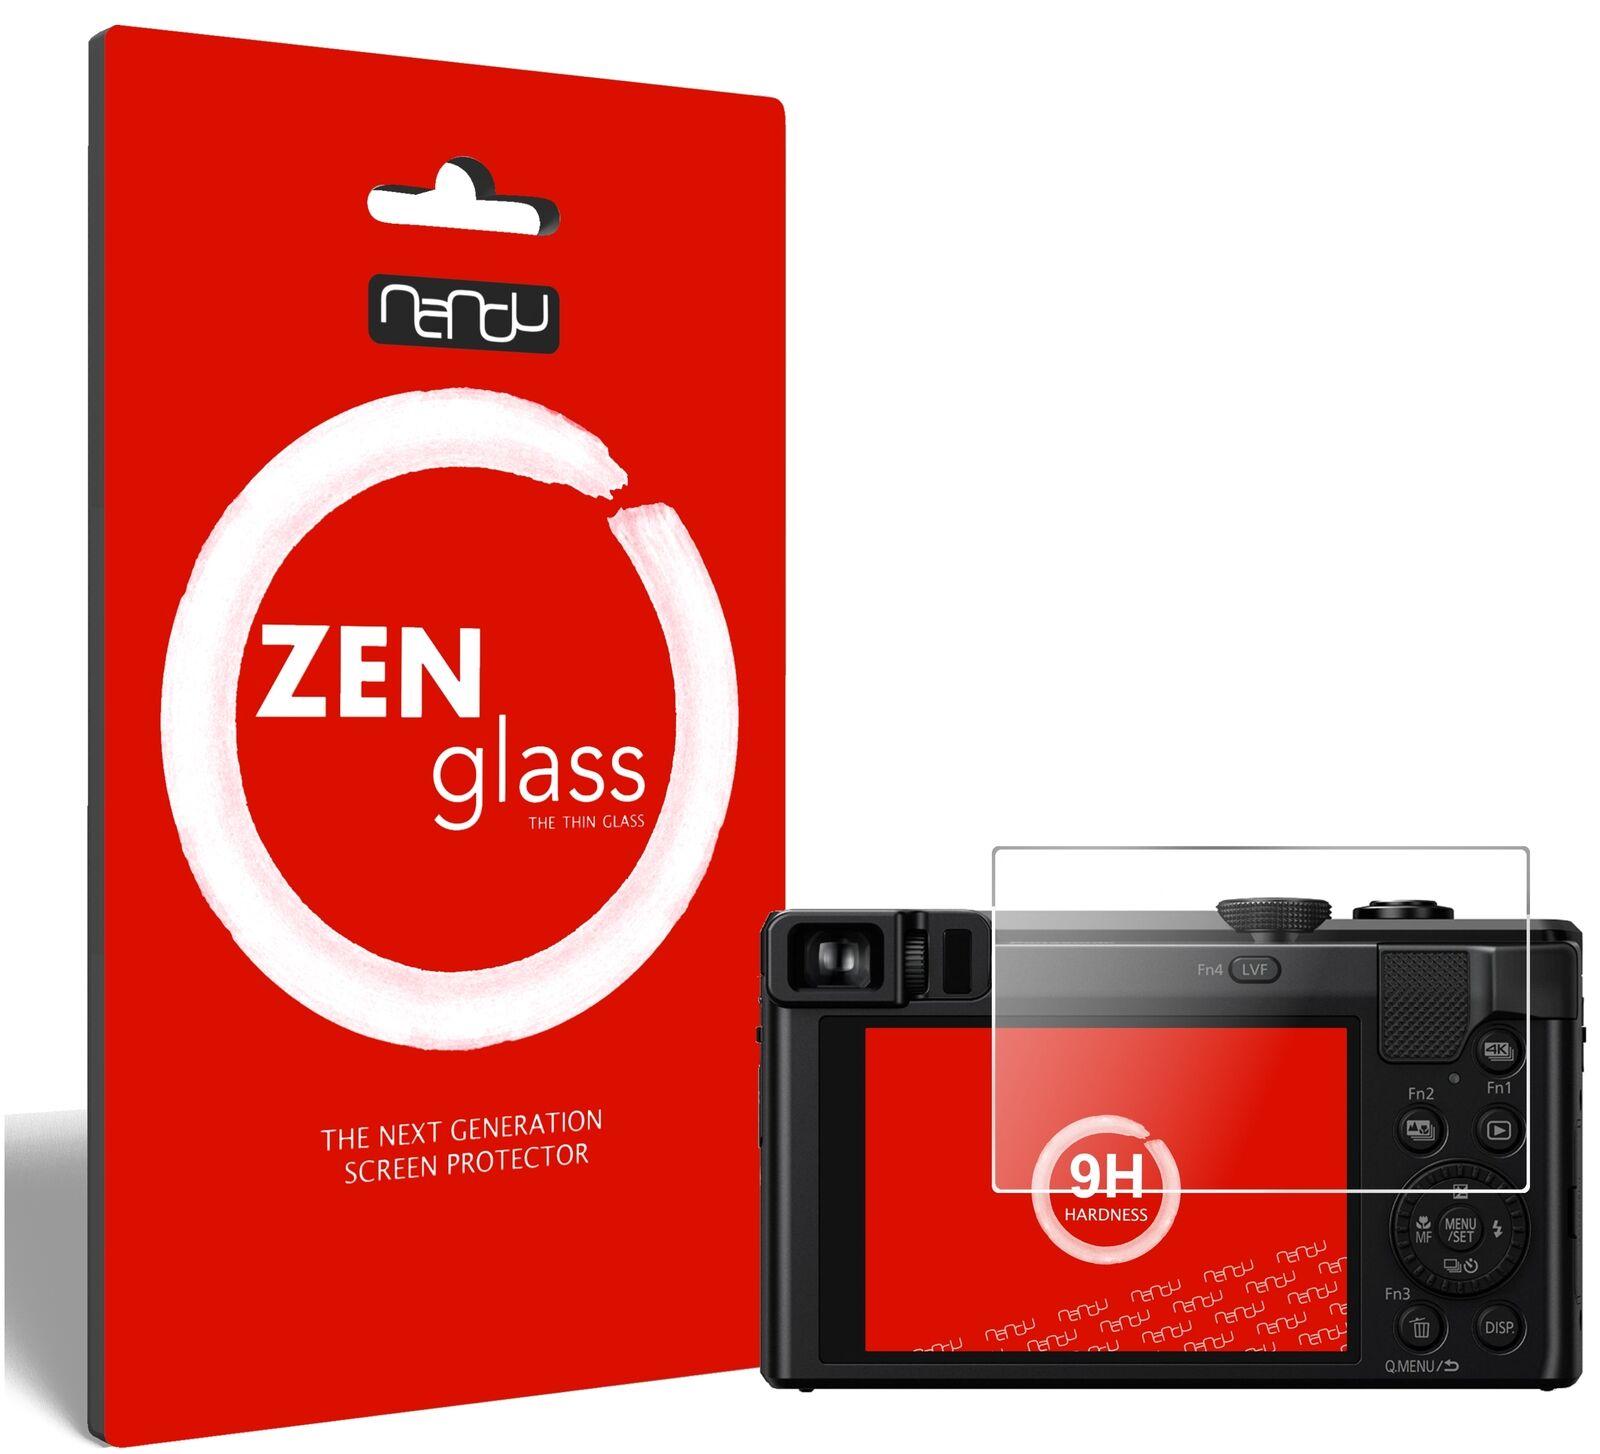 ZenGlass Flexible Glass Film for Panasonic Lumix TZ81 I Screen Protector 9H